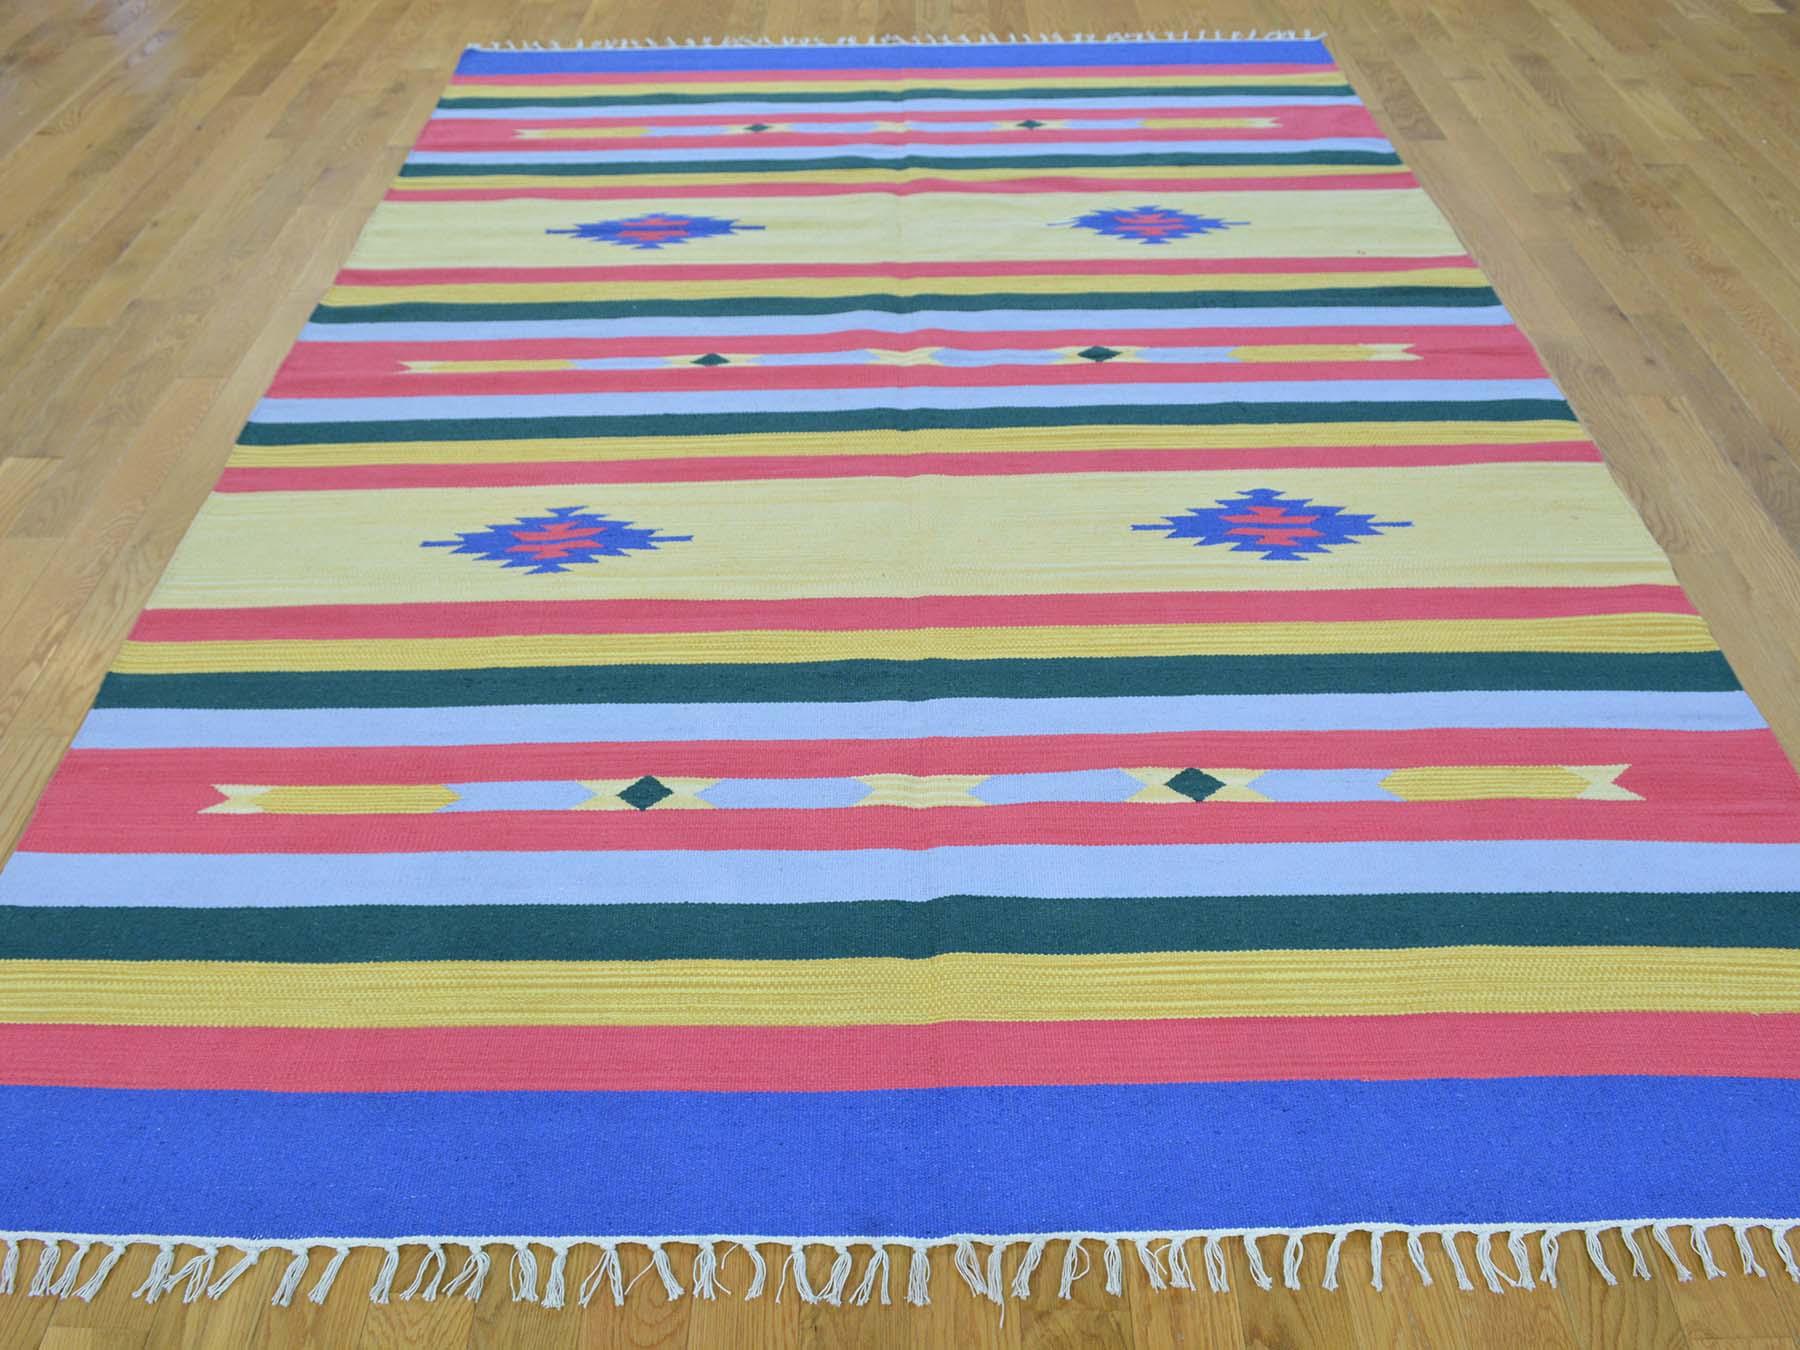 6-x9- Hand Woven Flat Weave Killim Navajo Design Oriental Rug